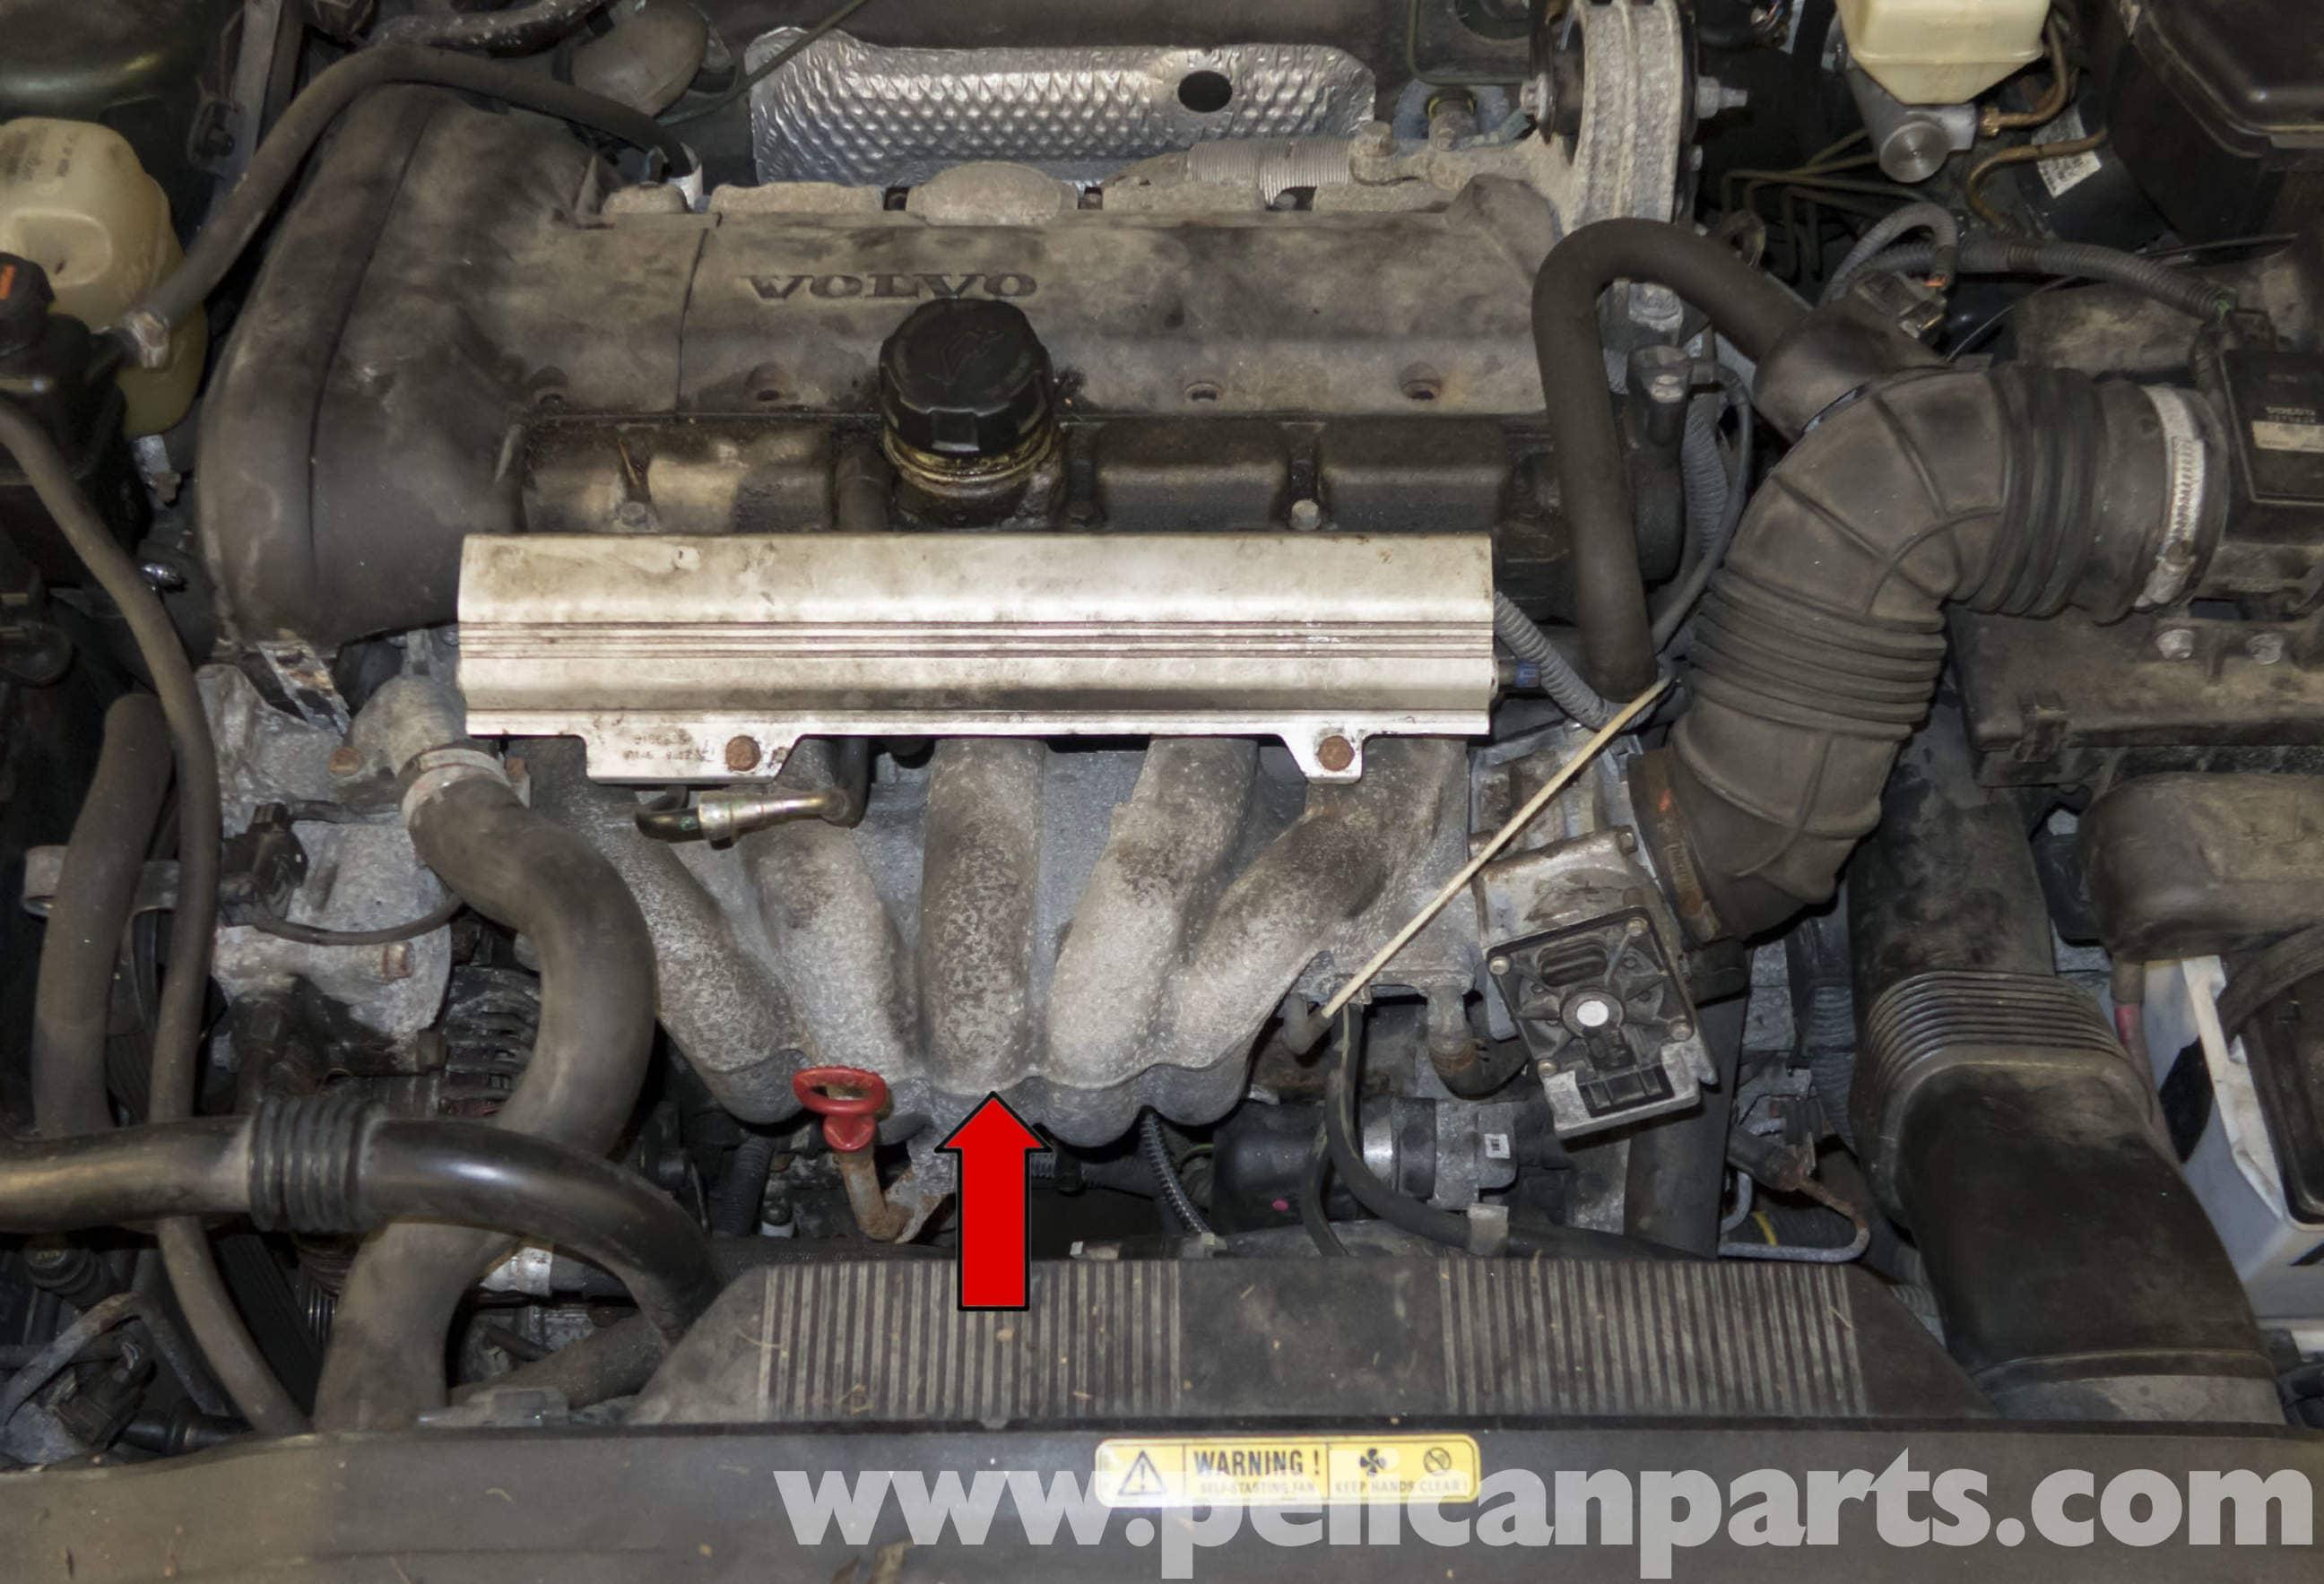 2010 Chevy Aveo Engine Diagram Volvo V70 Intake Manifold Replacement 1998 2007